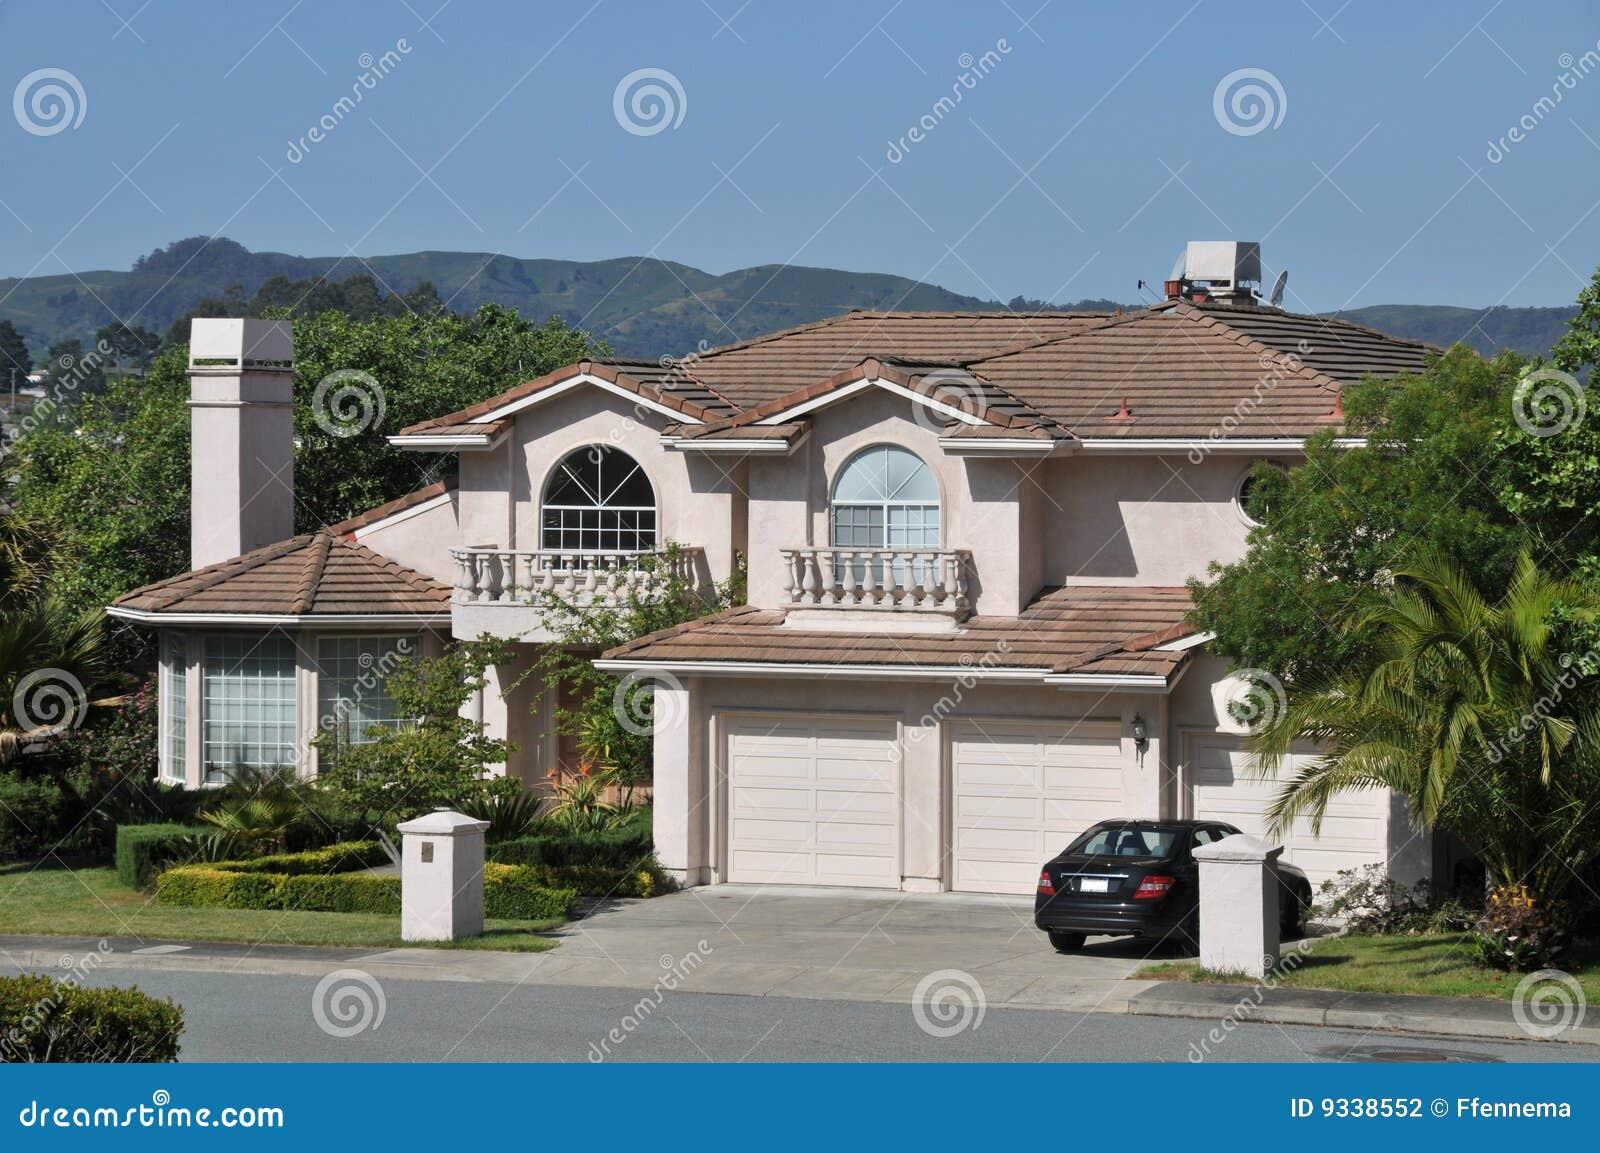 maison moderne avec le v hicule dans l 39 all e photographie stock image 9338552. Black Bedroom Furniture Sets. Home Design Ideas